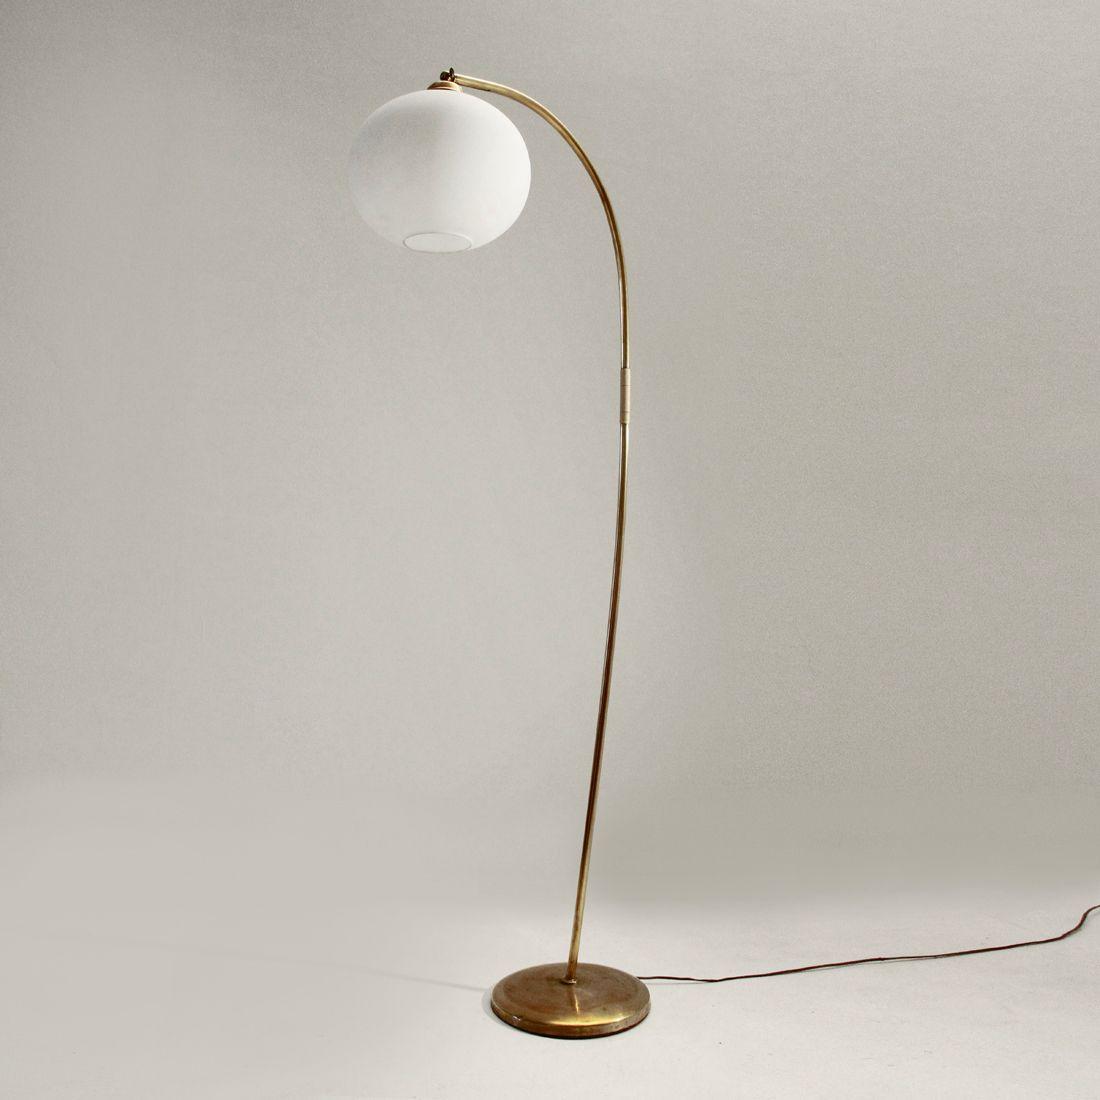 lampadaire en laiton italie 1940s en vente sur pamono. Black Bedroom Furniture Sets. Home Design Ideas